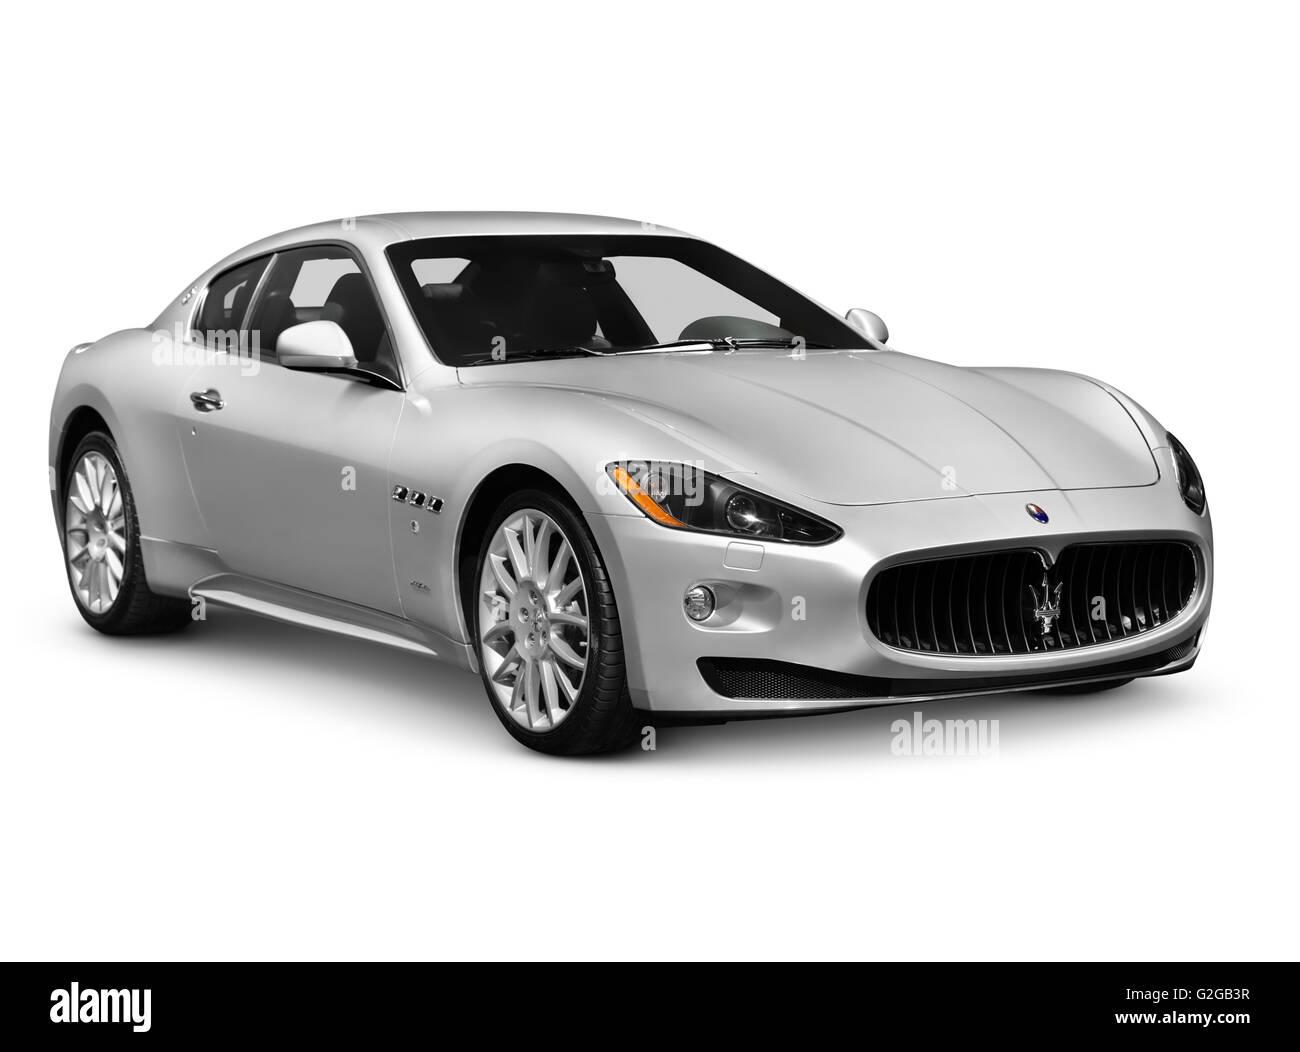 2010 Silver Maserati GranTurismo two-door coupe luxury car Stock ...